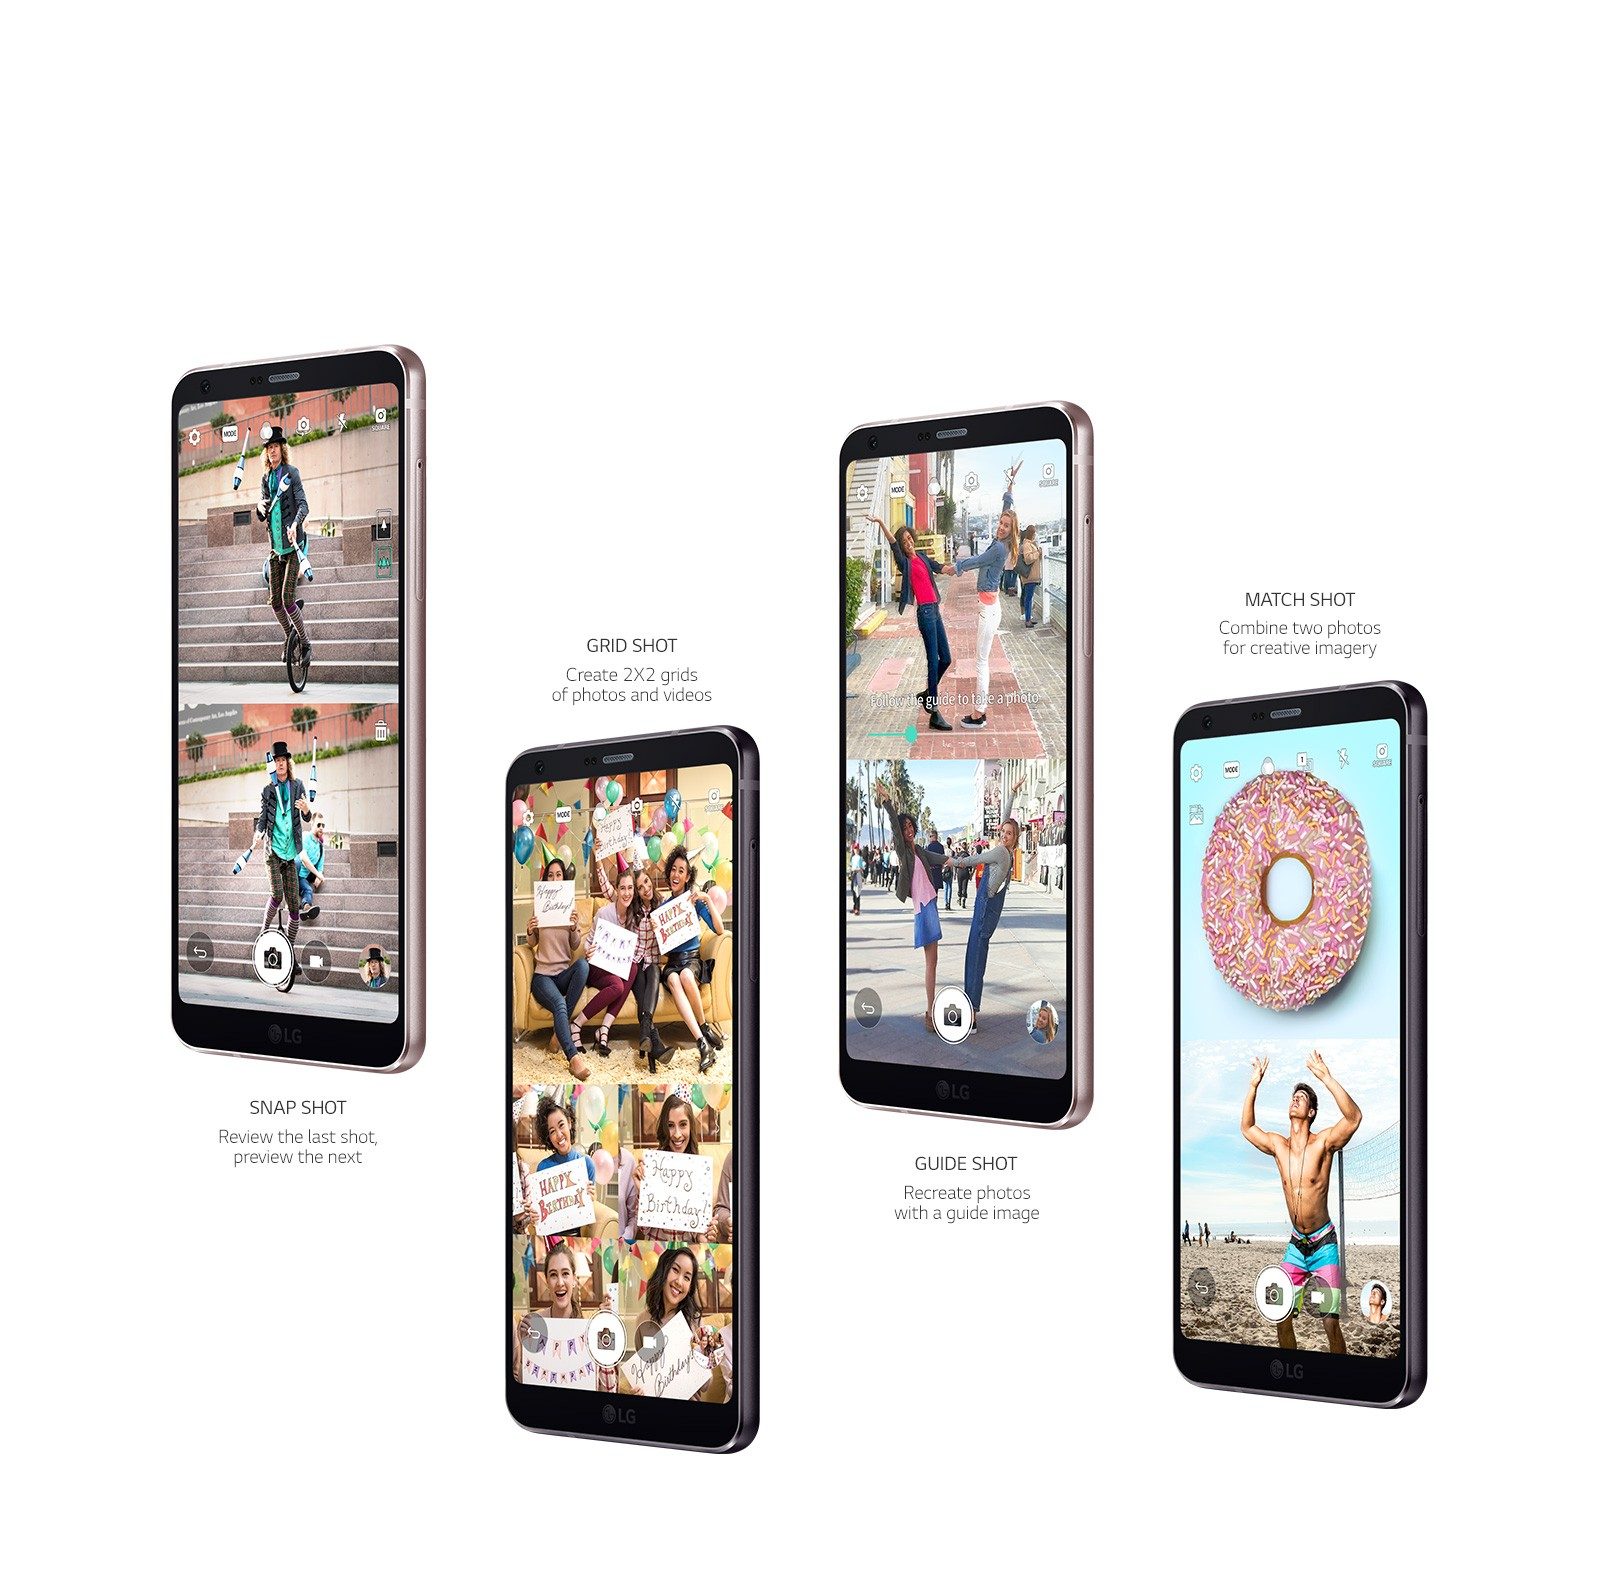 LG G6 Plus 128GB